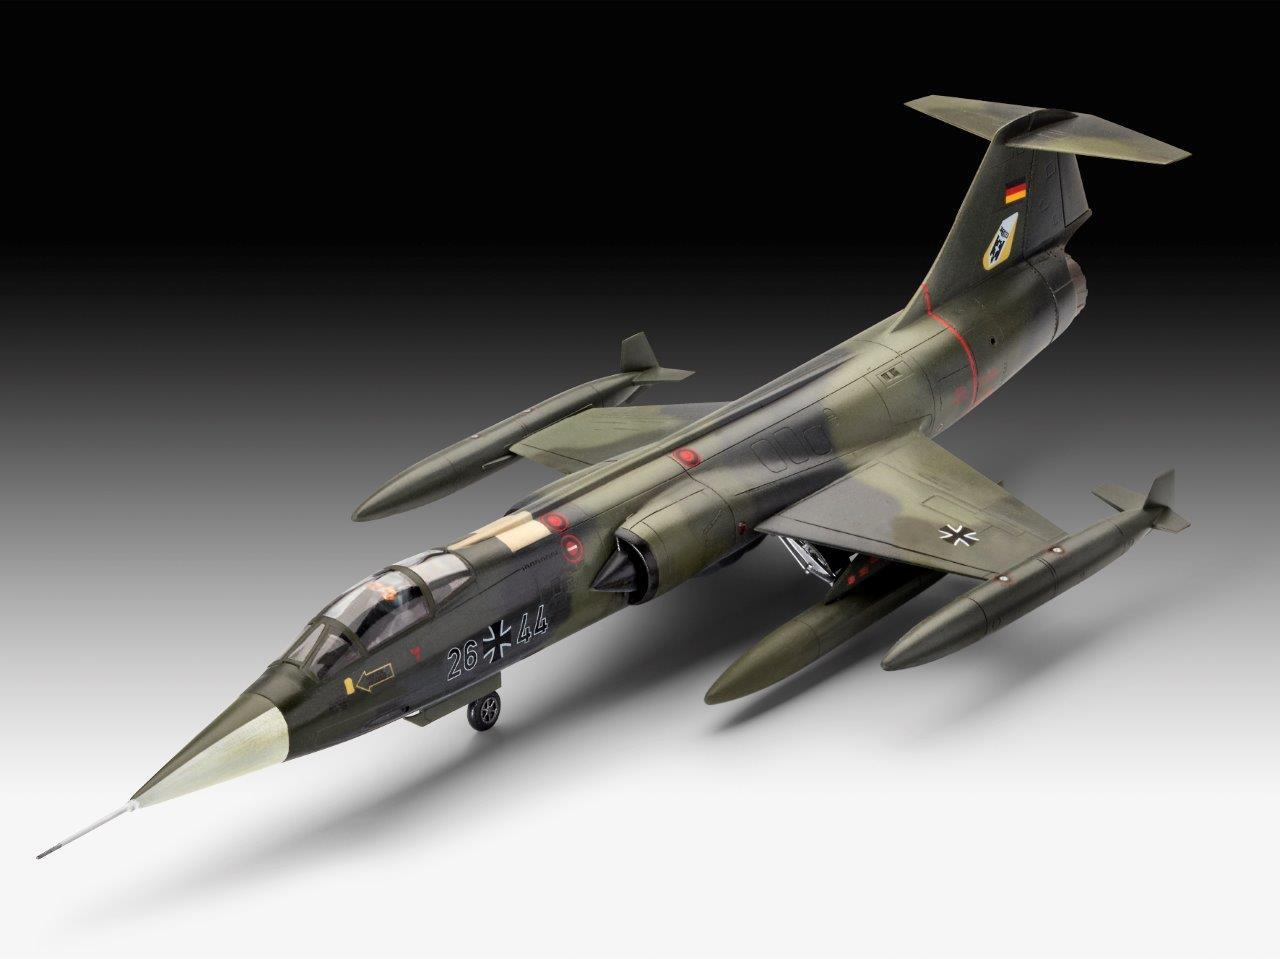 F-104G Starfighter Lockheed Martin